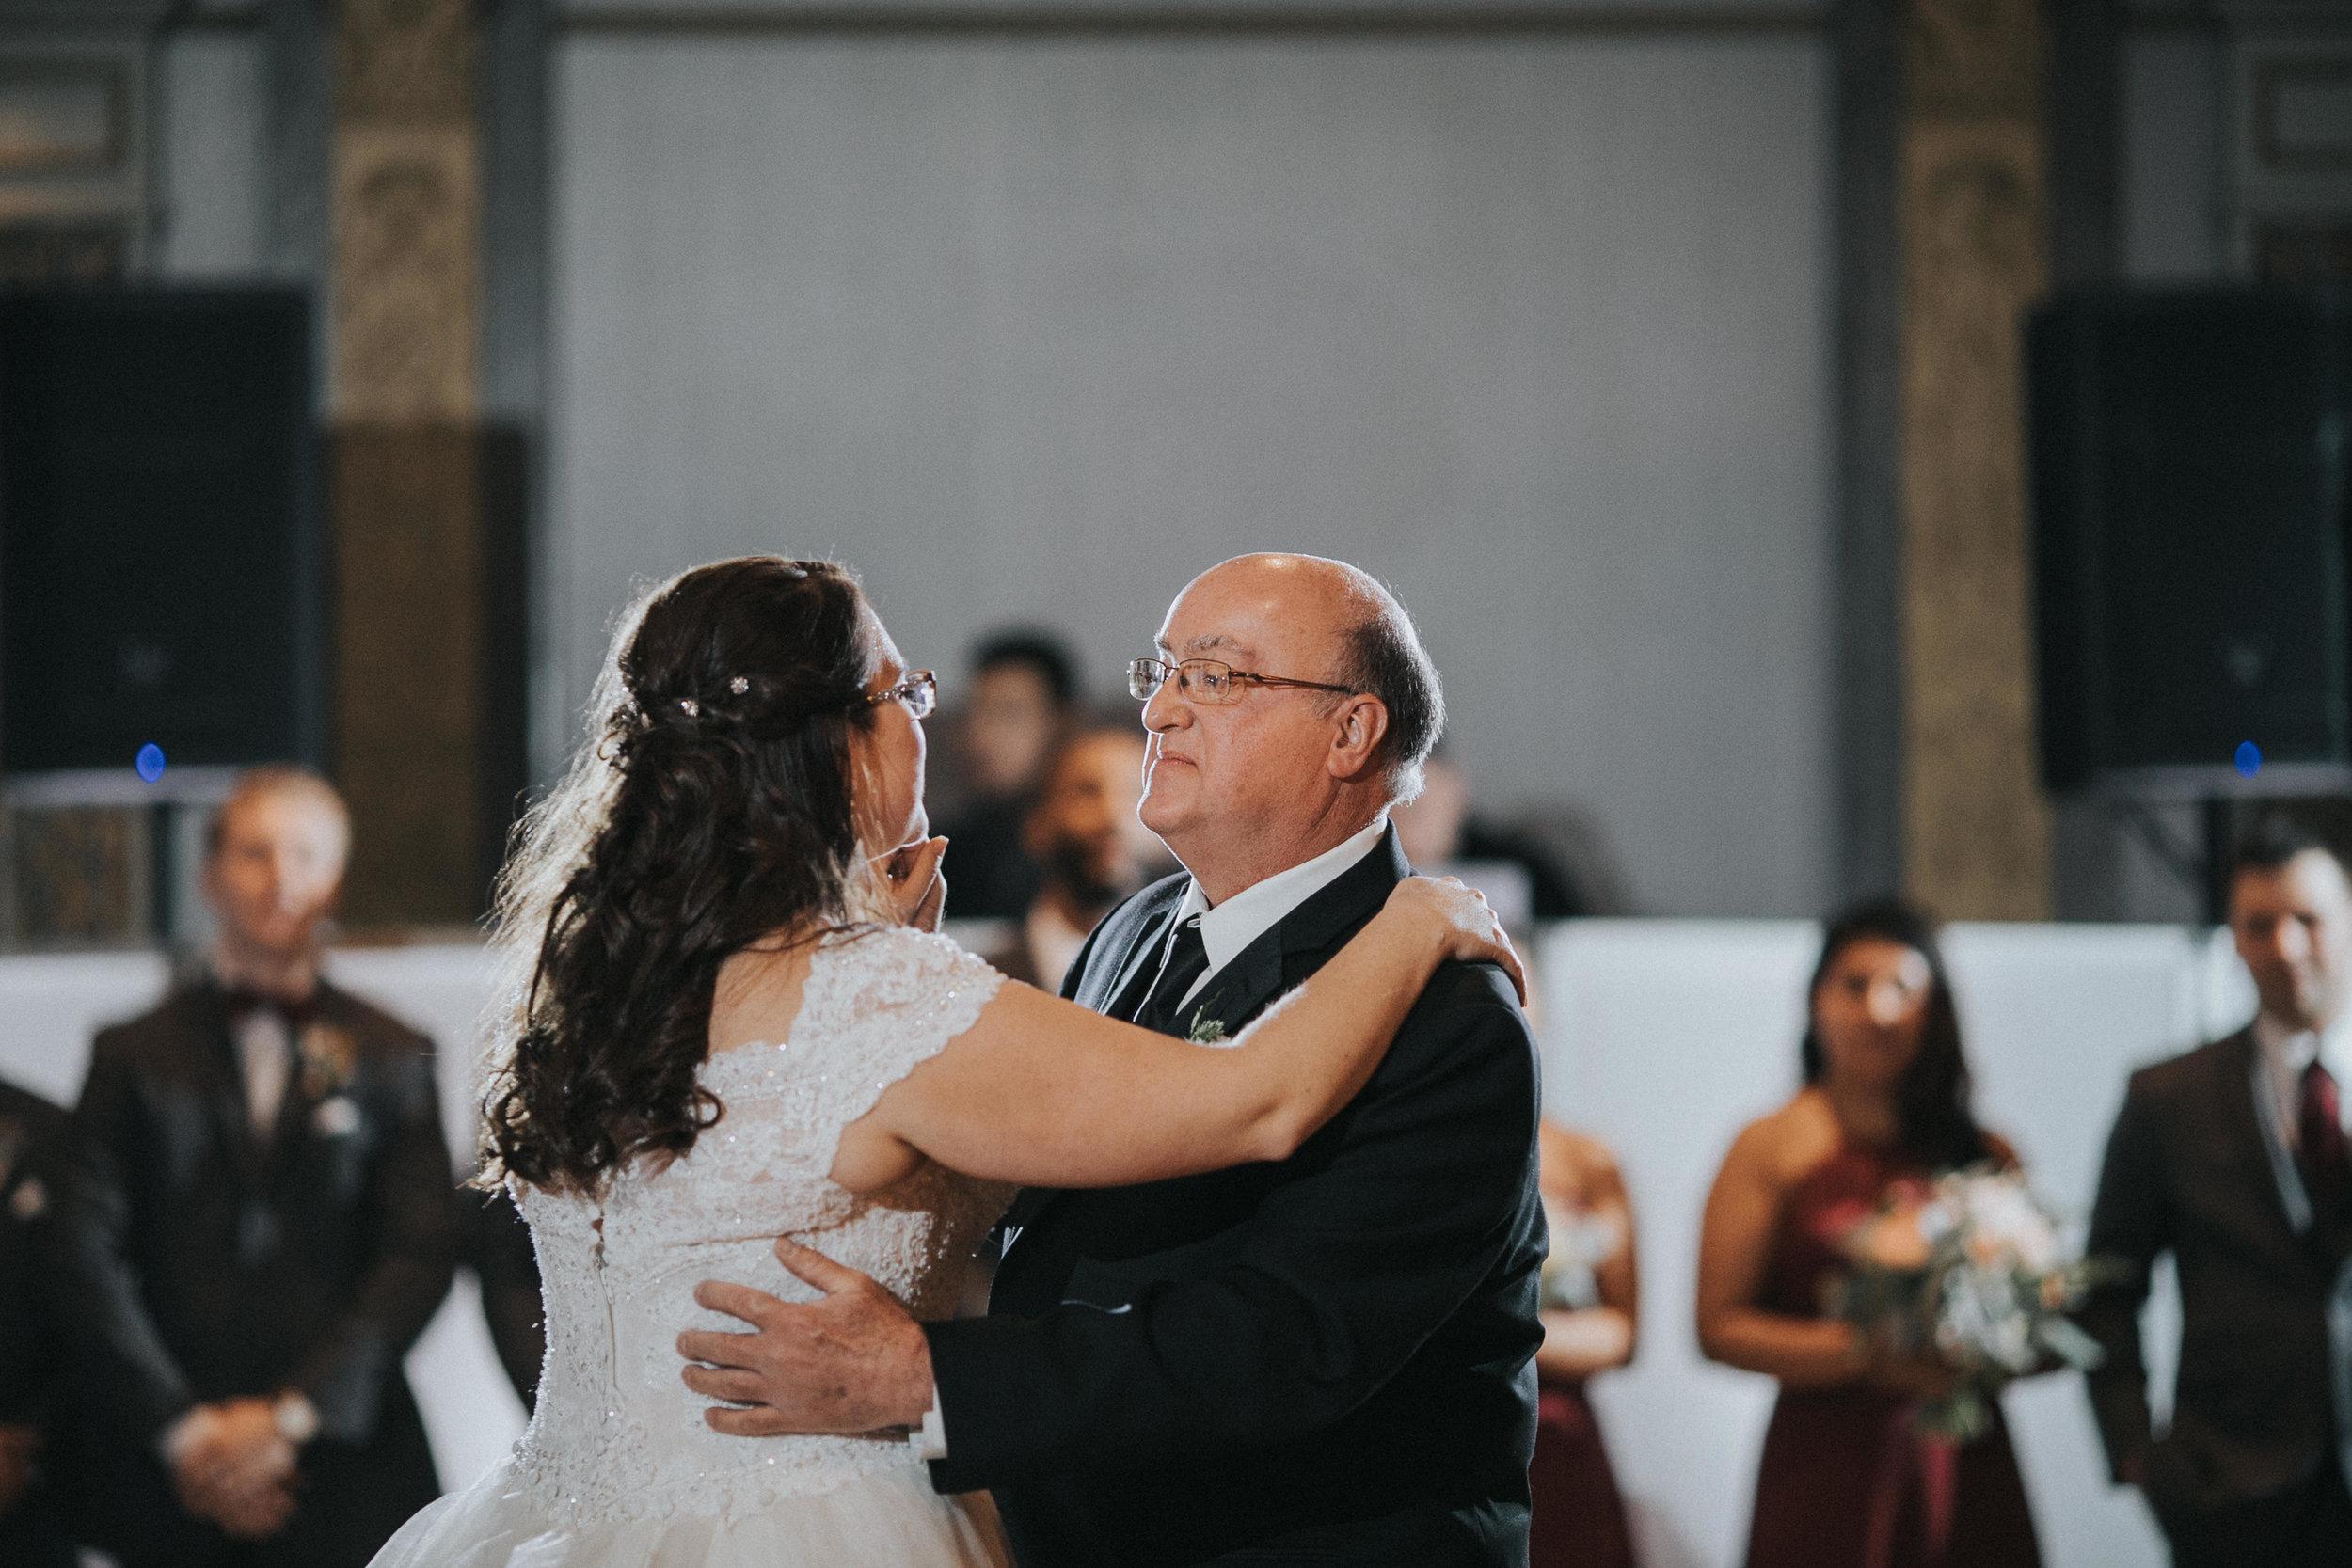 New-Jersey-Wedding-Photography-Fishers-Tudor-House-JennaLynnPhotography-Reception-Kathleen&Eddie-104.jpg